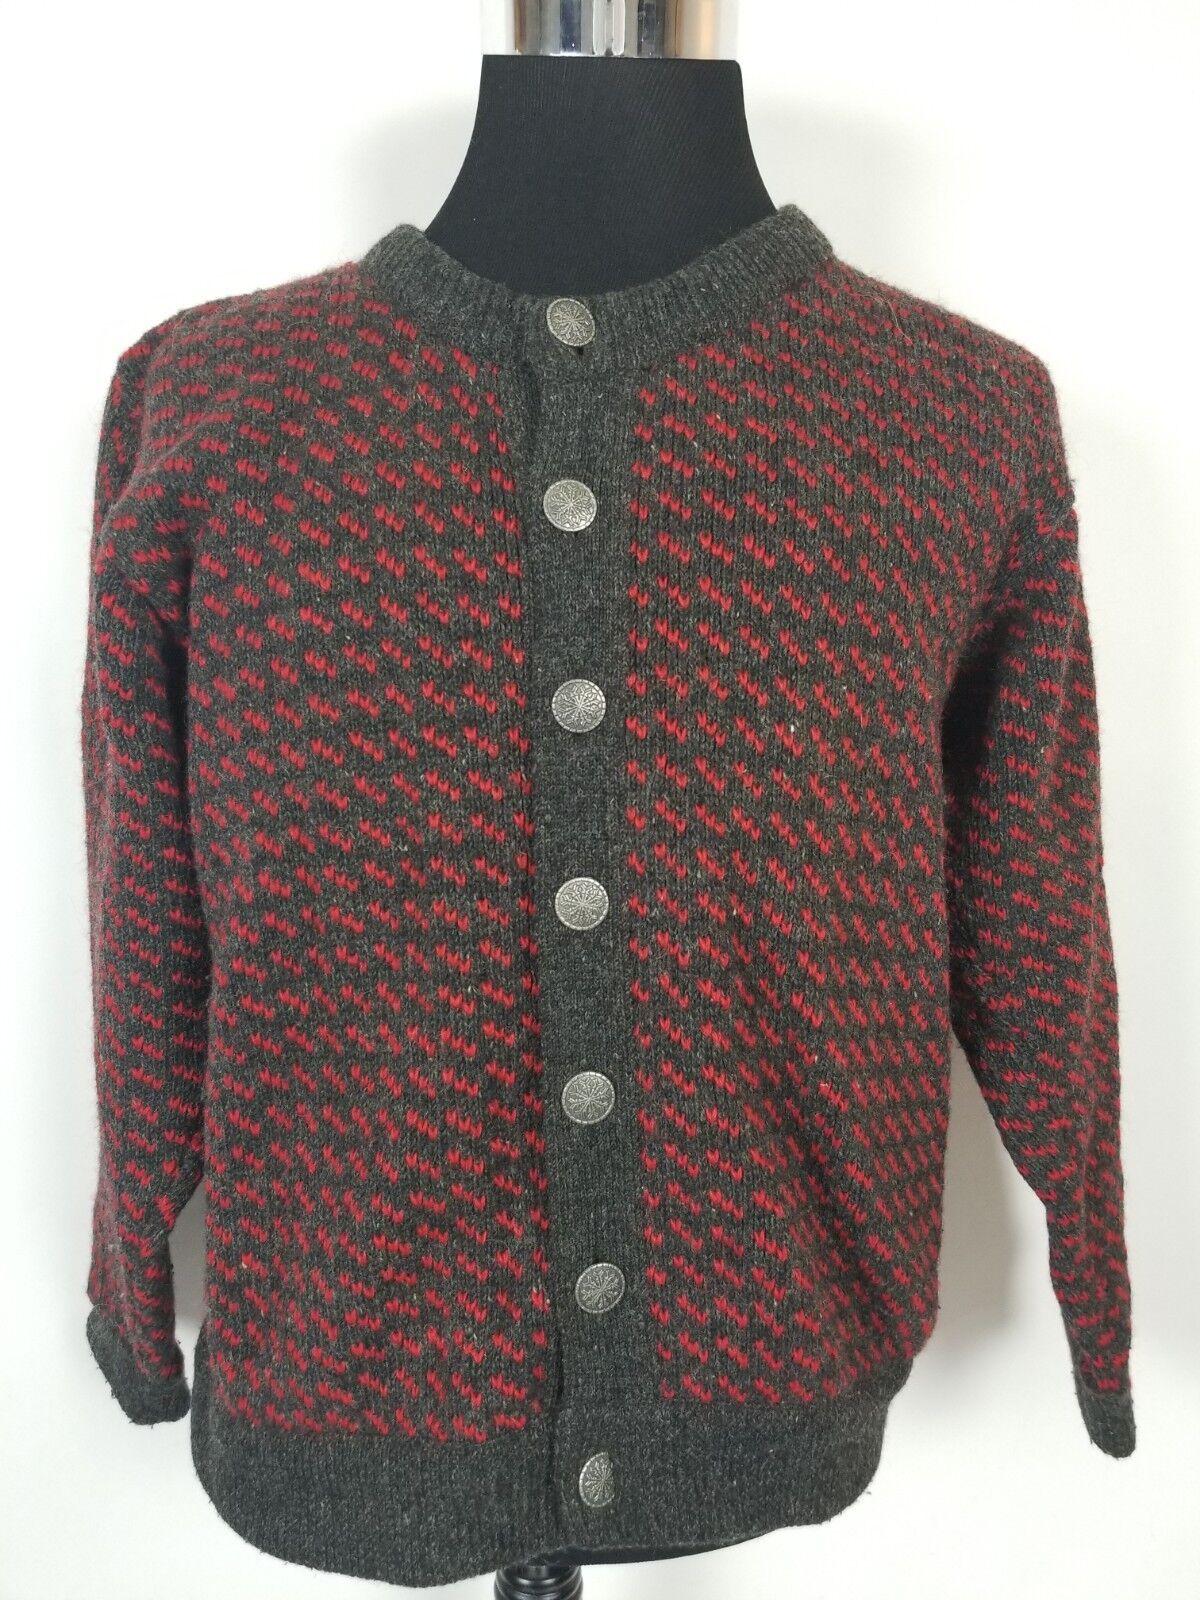 Vintage L.L. Bean Wool Blend Cardigan Snowflake Button Sweater Norway Sz Med